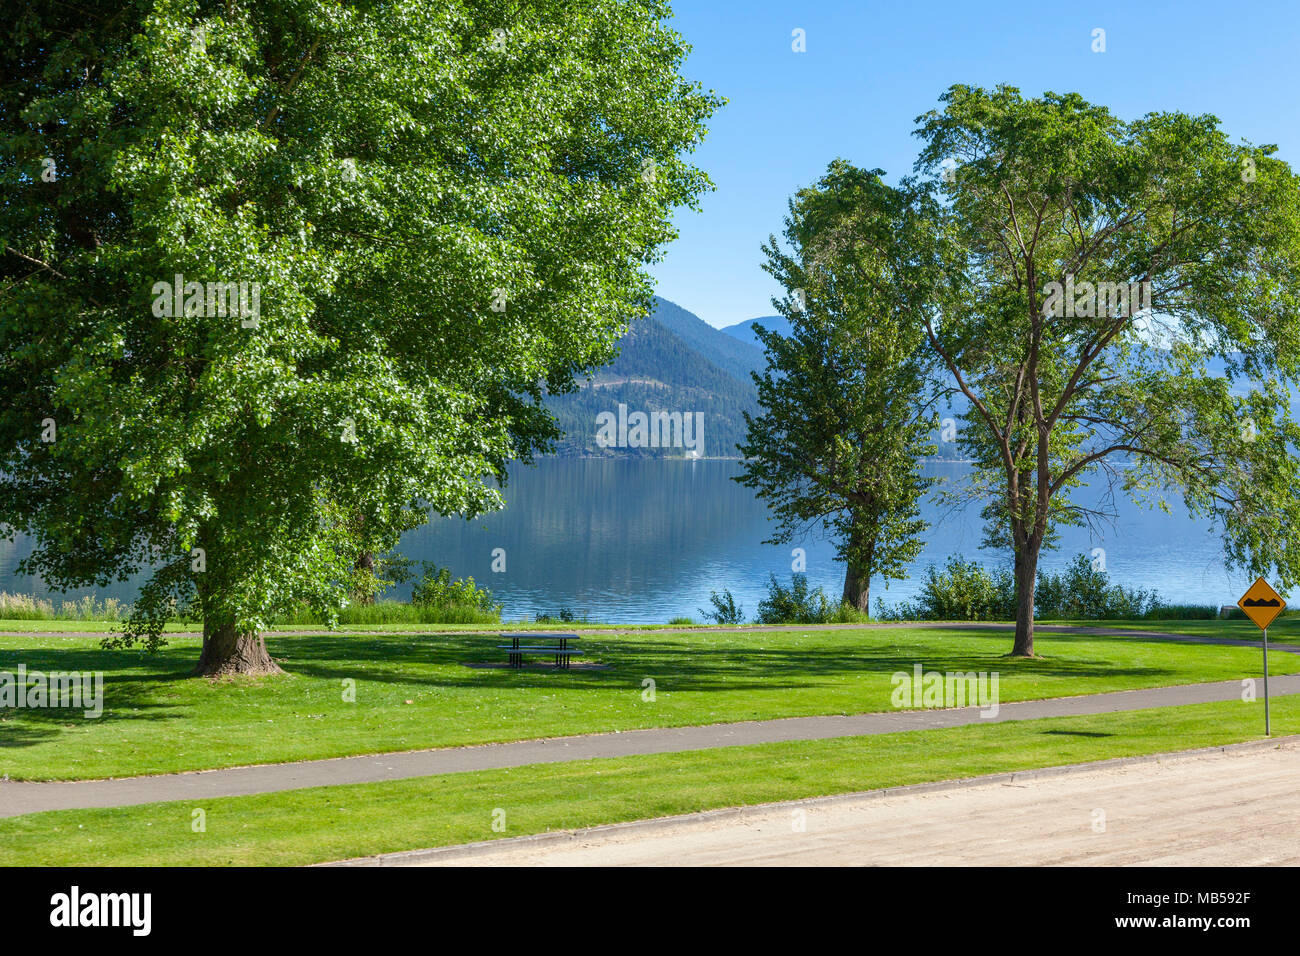 Scenic British Columbia, Canada - Stock Image